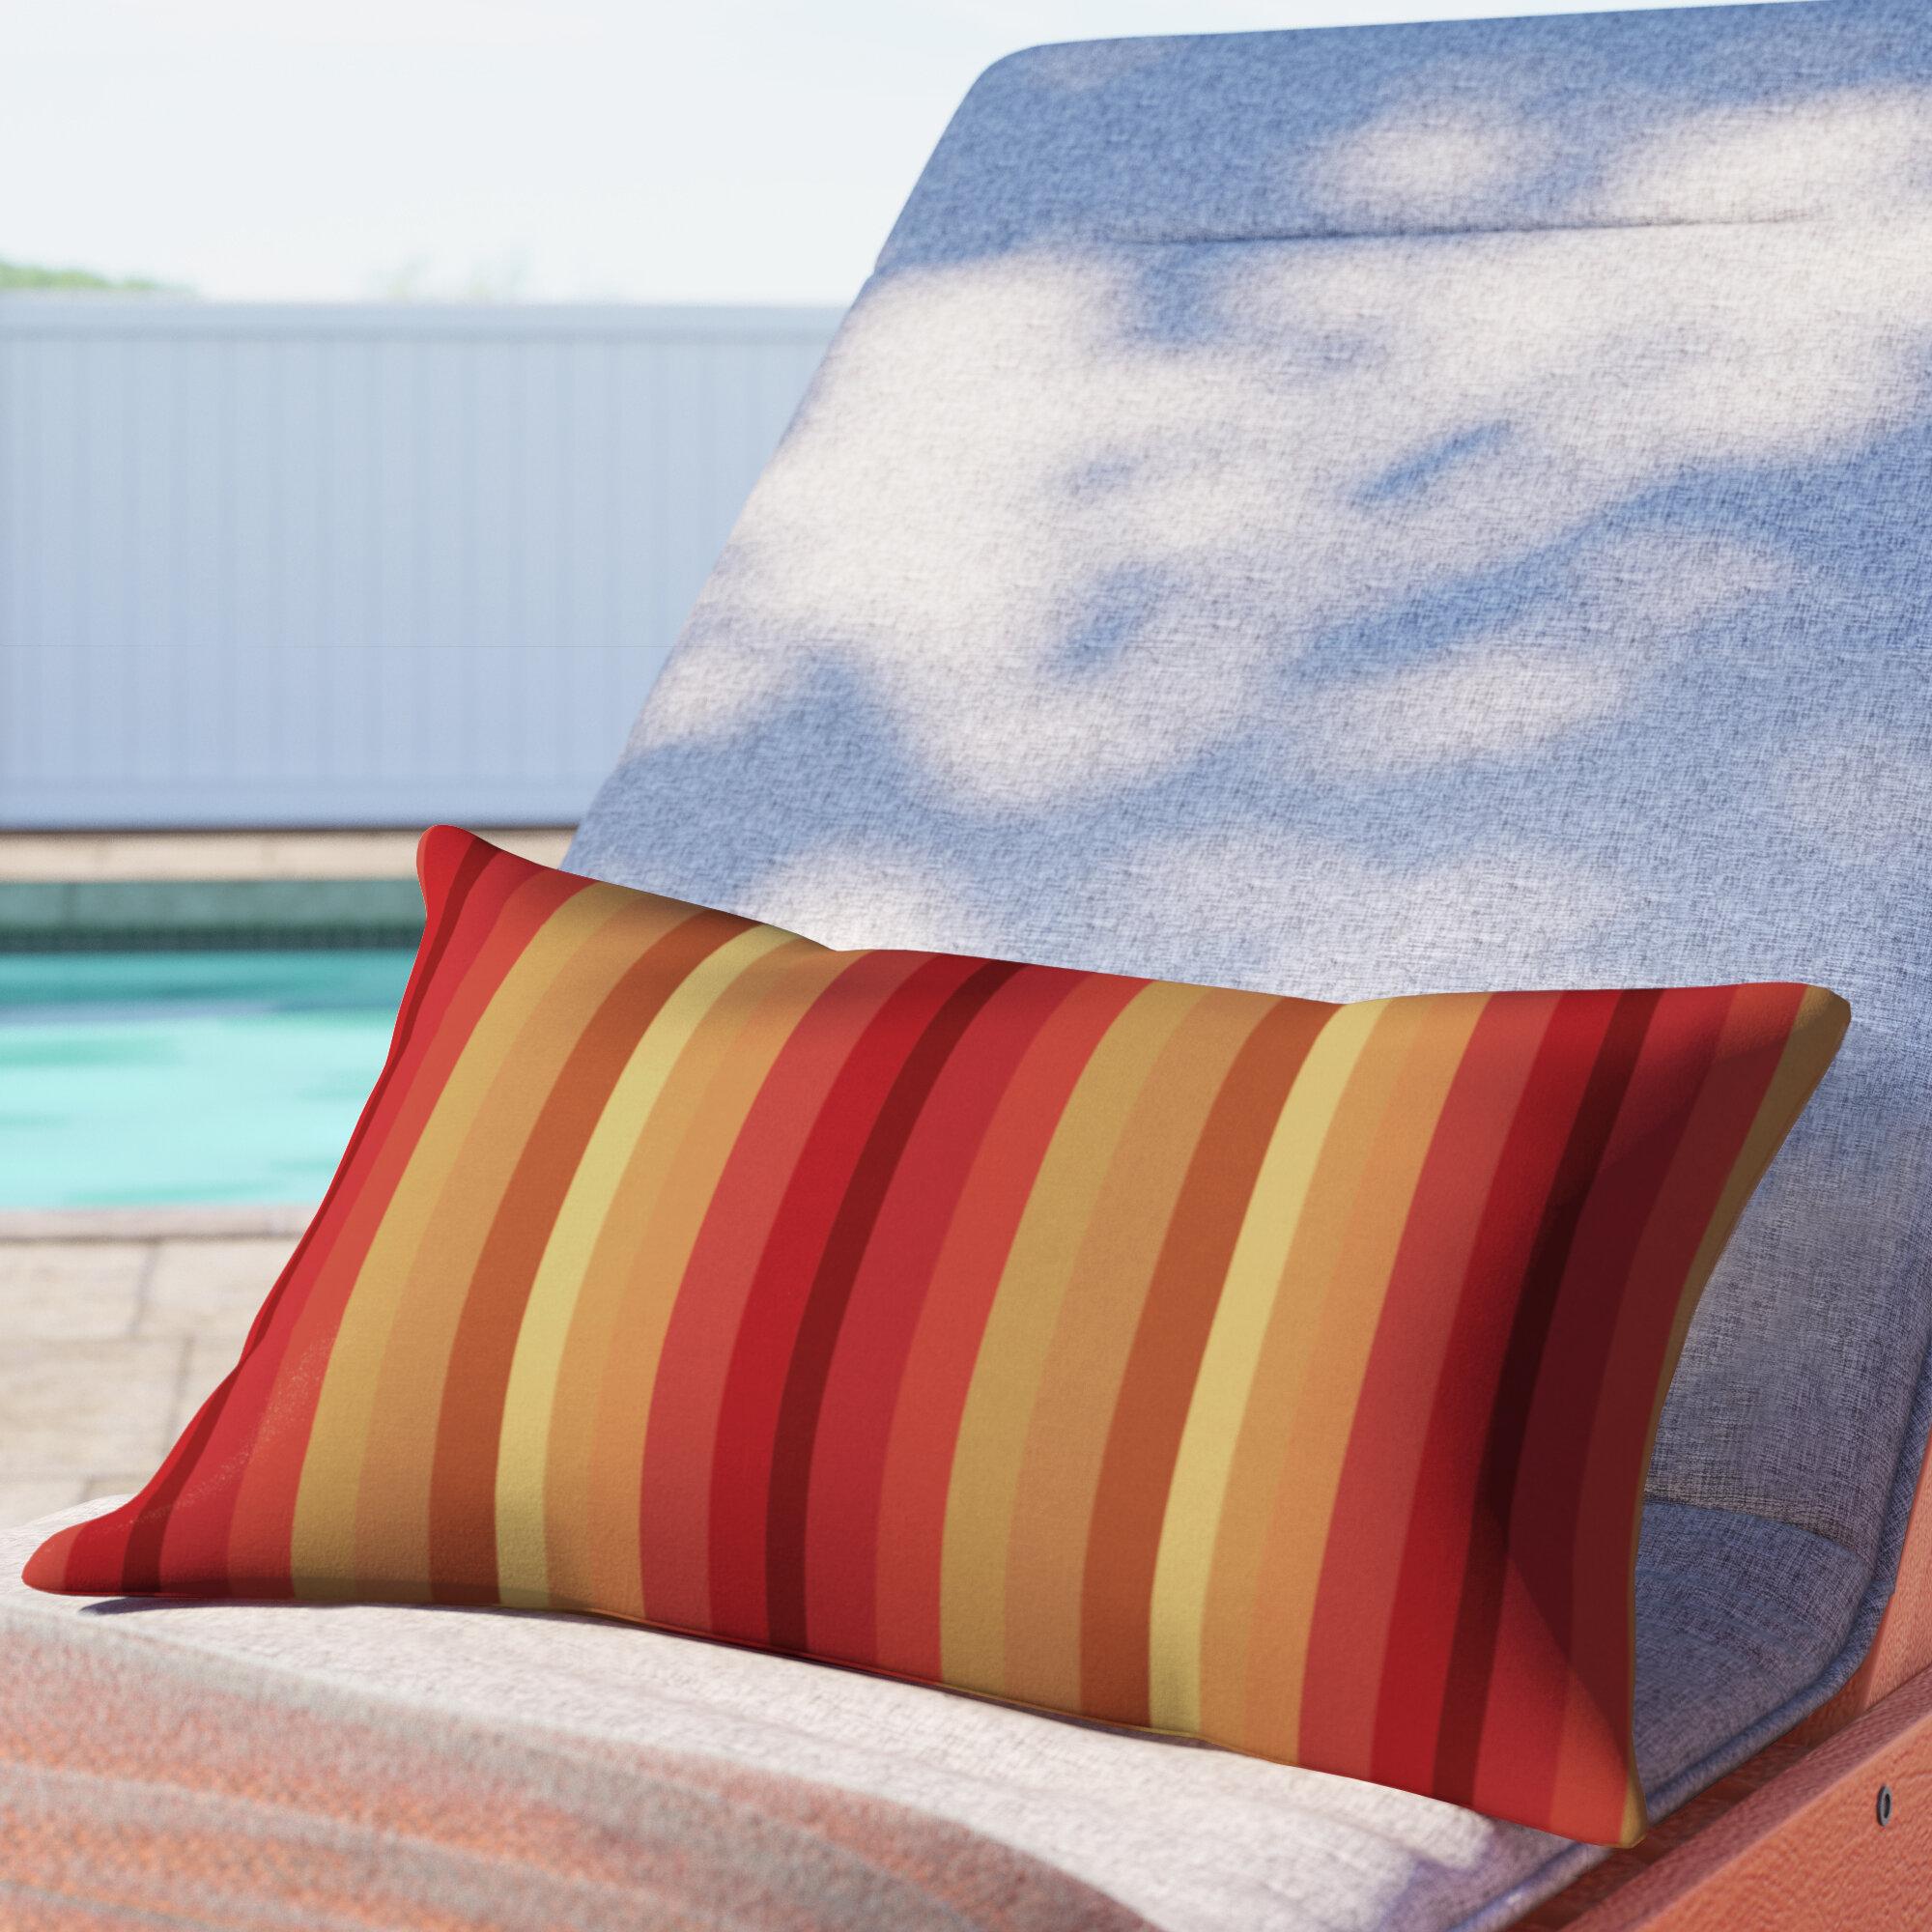 Set Of 4 Outdoor Decorative Lumbar Pillows Sunbrella Maxim Heather Beige Indian South Asian Home Décor Pillows Home Garden